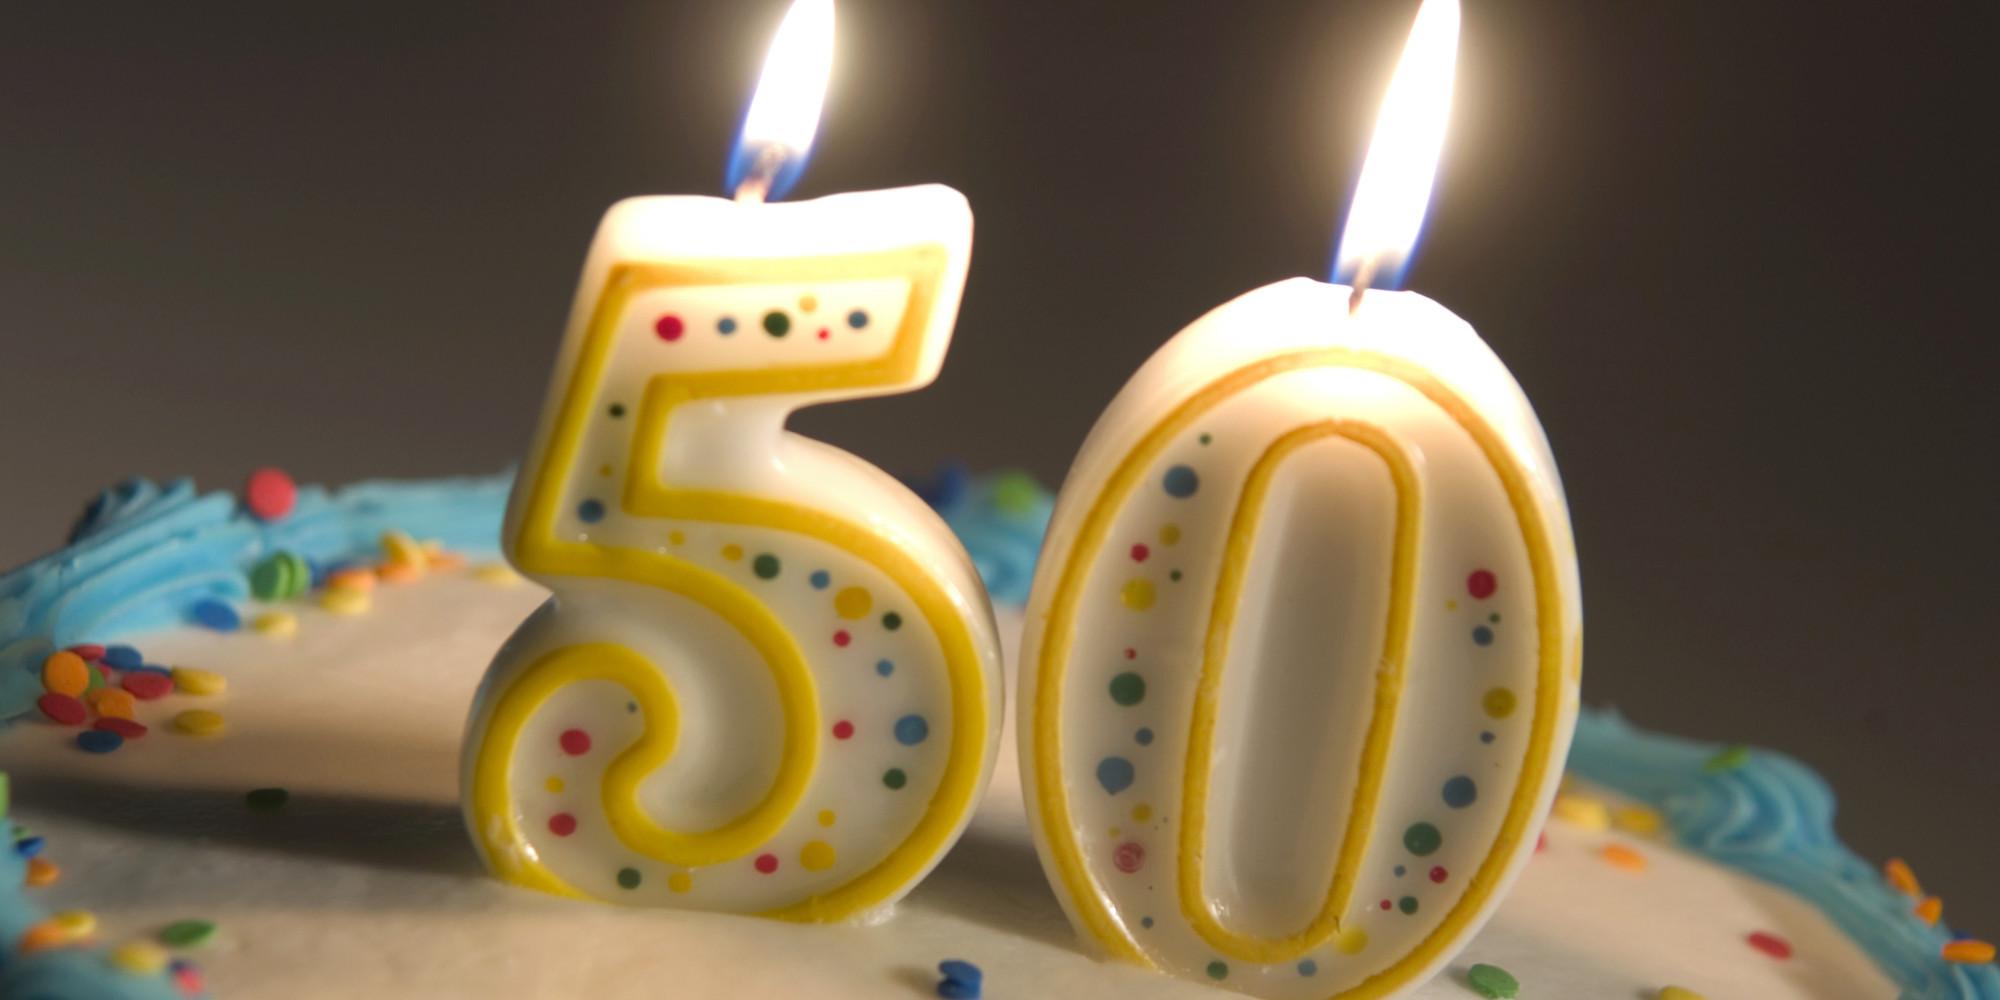 50 Over 50 Giving Back Huffpost